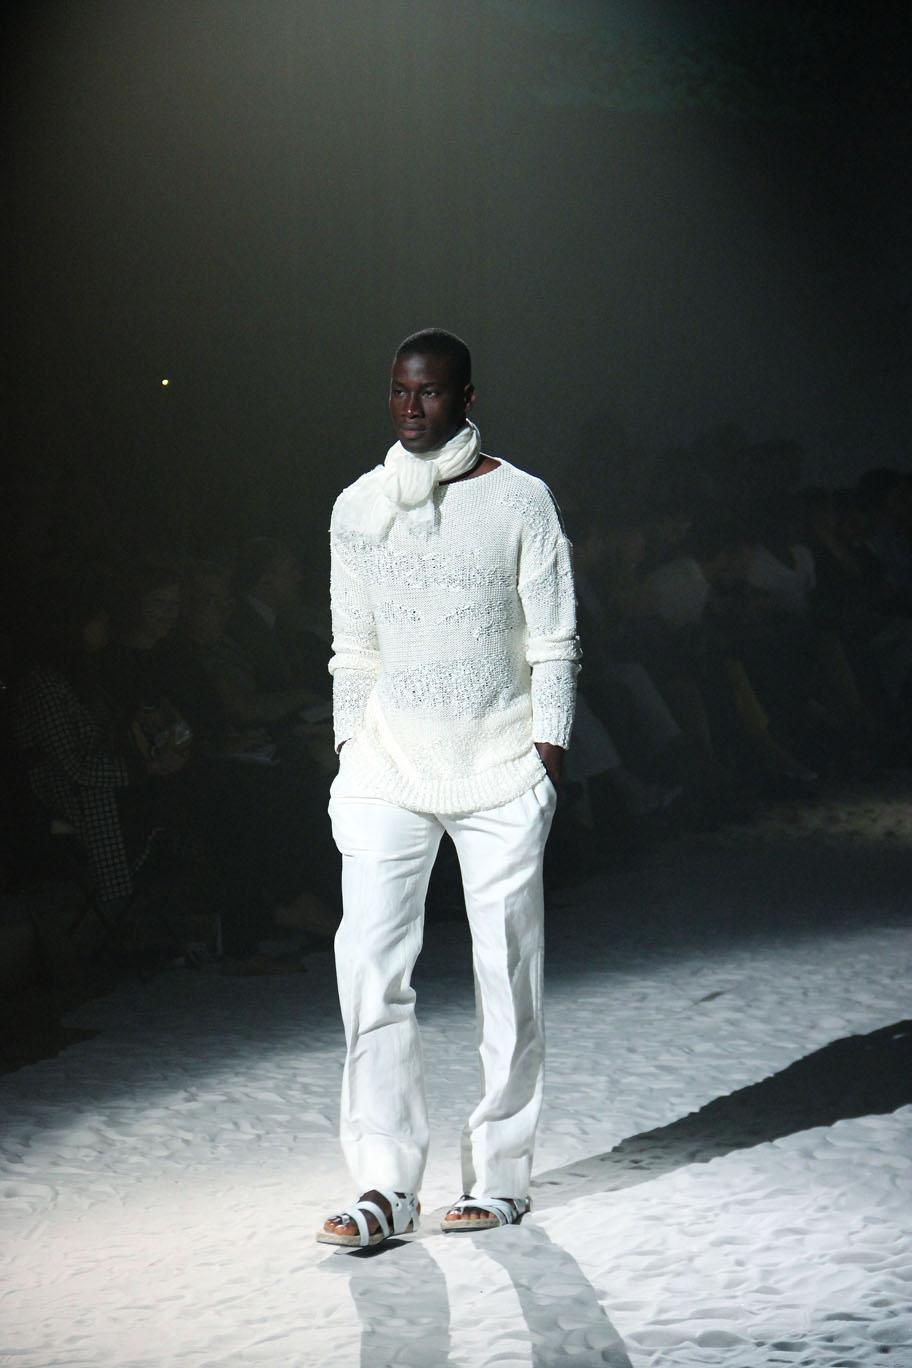 corneliani-spring-summer-2012-men-collection-milano-fashion-week-2012-corneliani-primavera-estate-corneliani-fashion-show-catwalk-2012